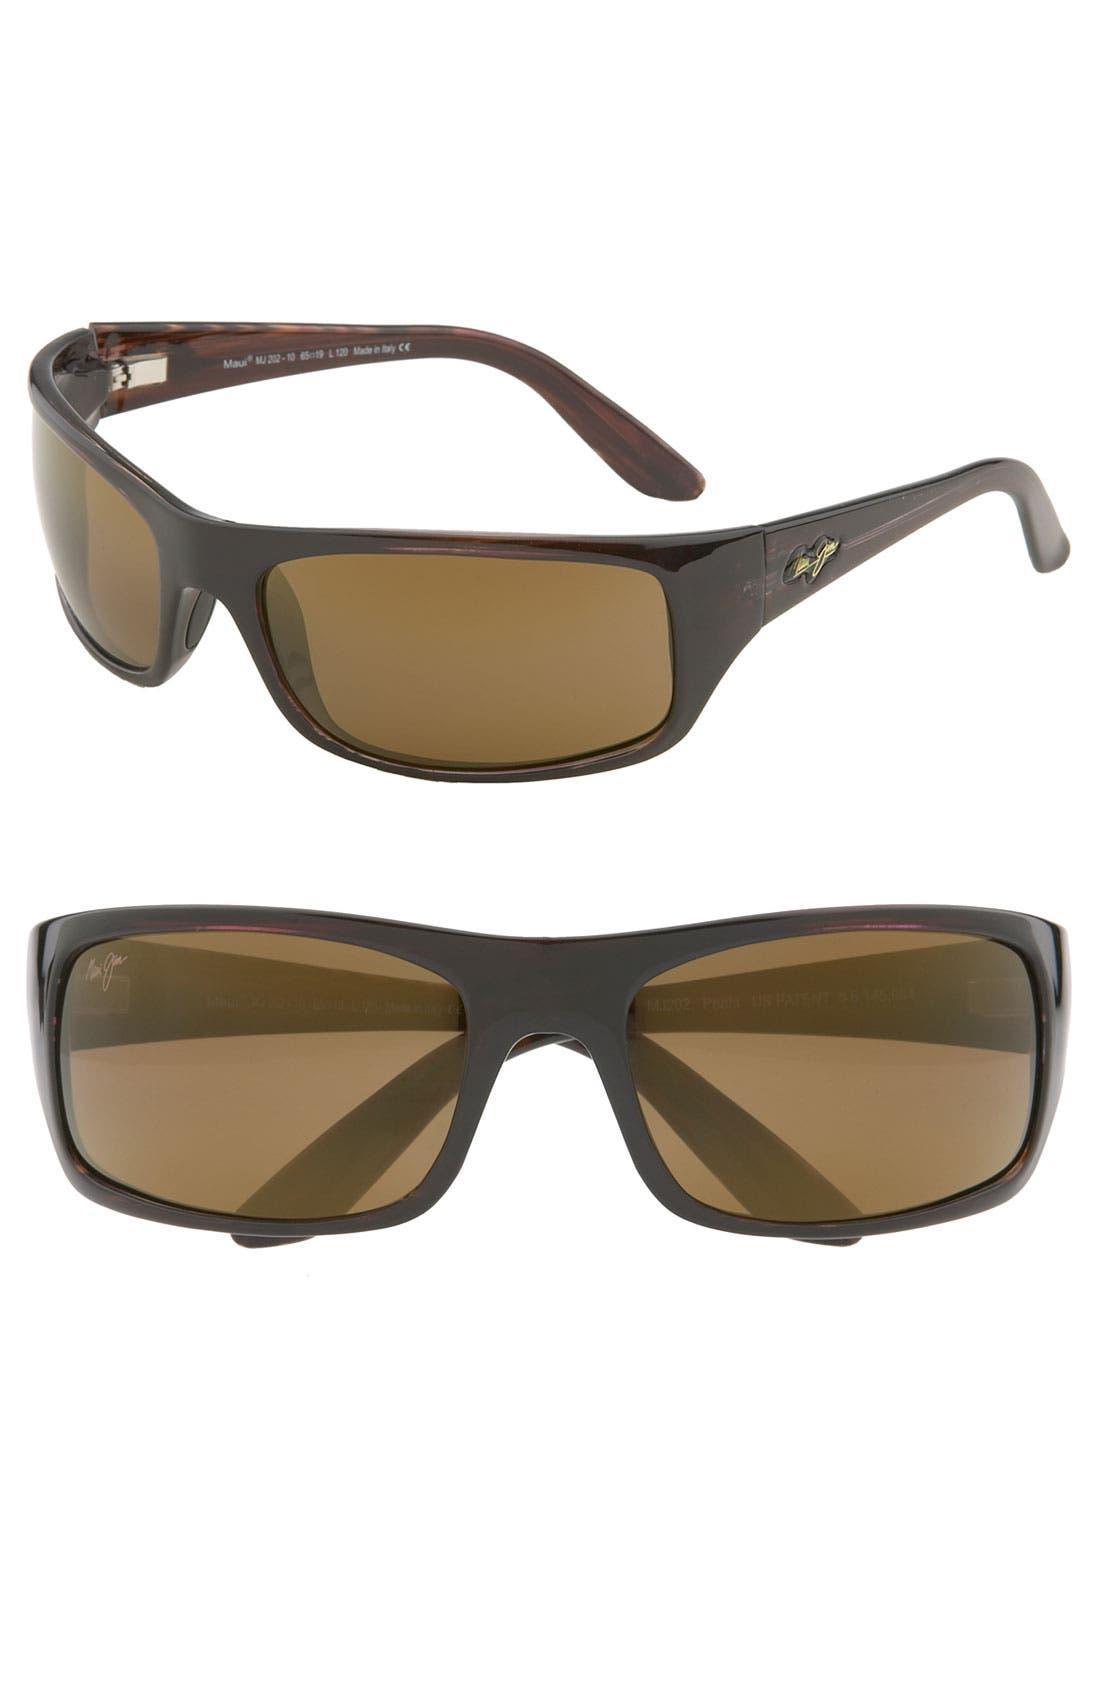 'Peahi - PolarizedPlus<sup>®</sup>2' 67mm Sunglasses,                             Main thumbnail 1, color,                             Tortoise / Hcl Bronze Lens